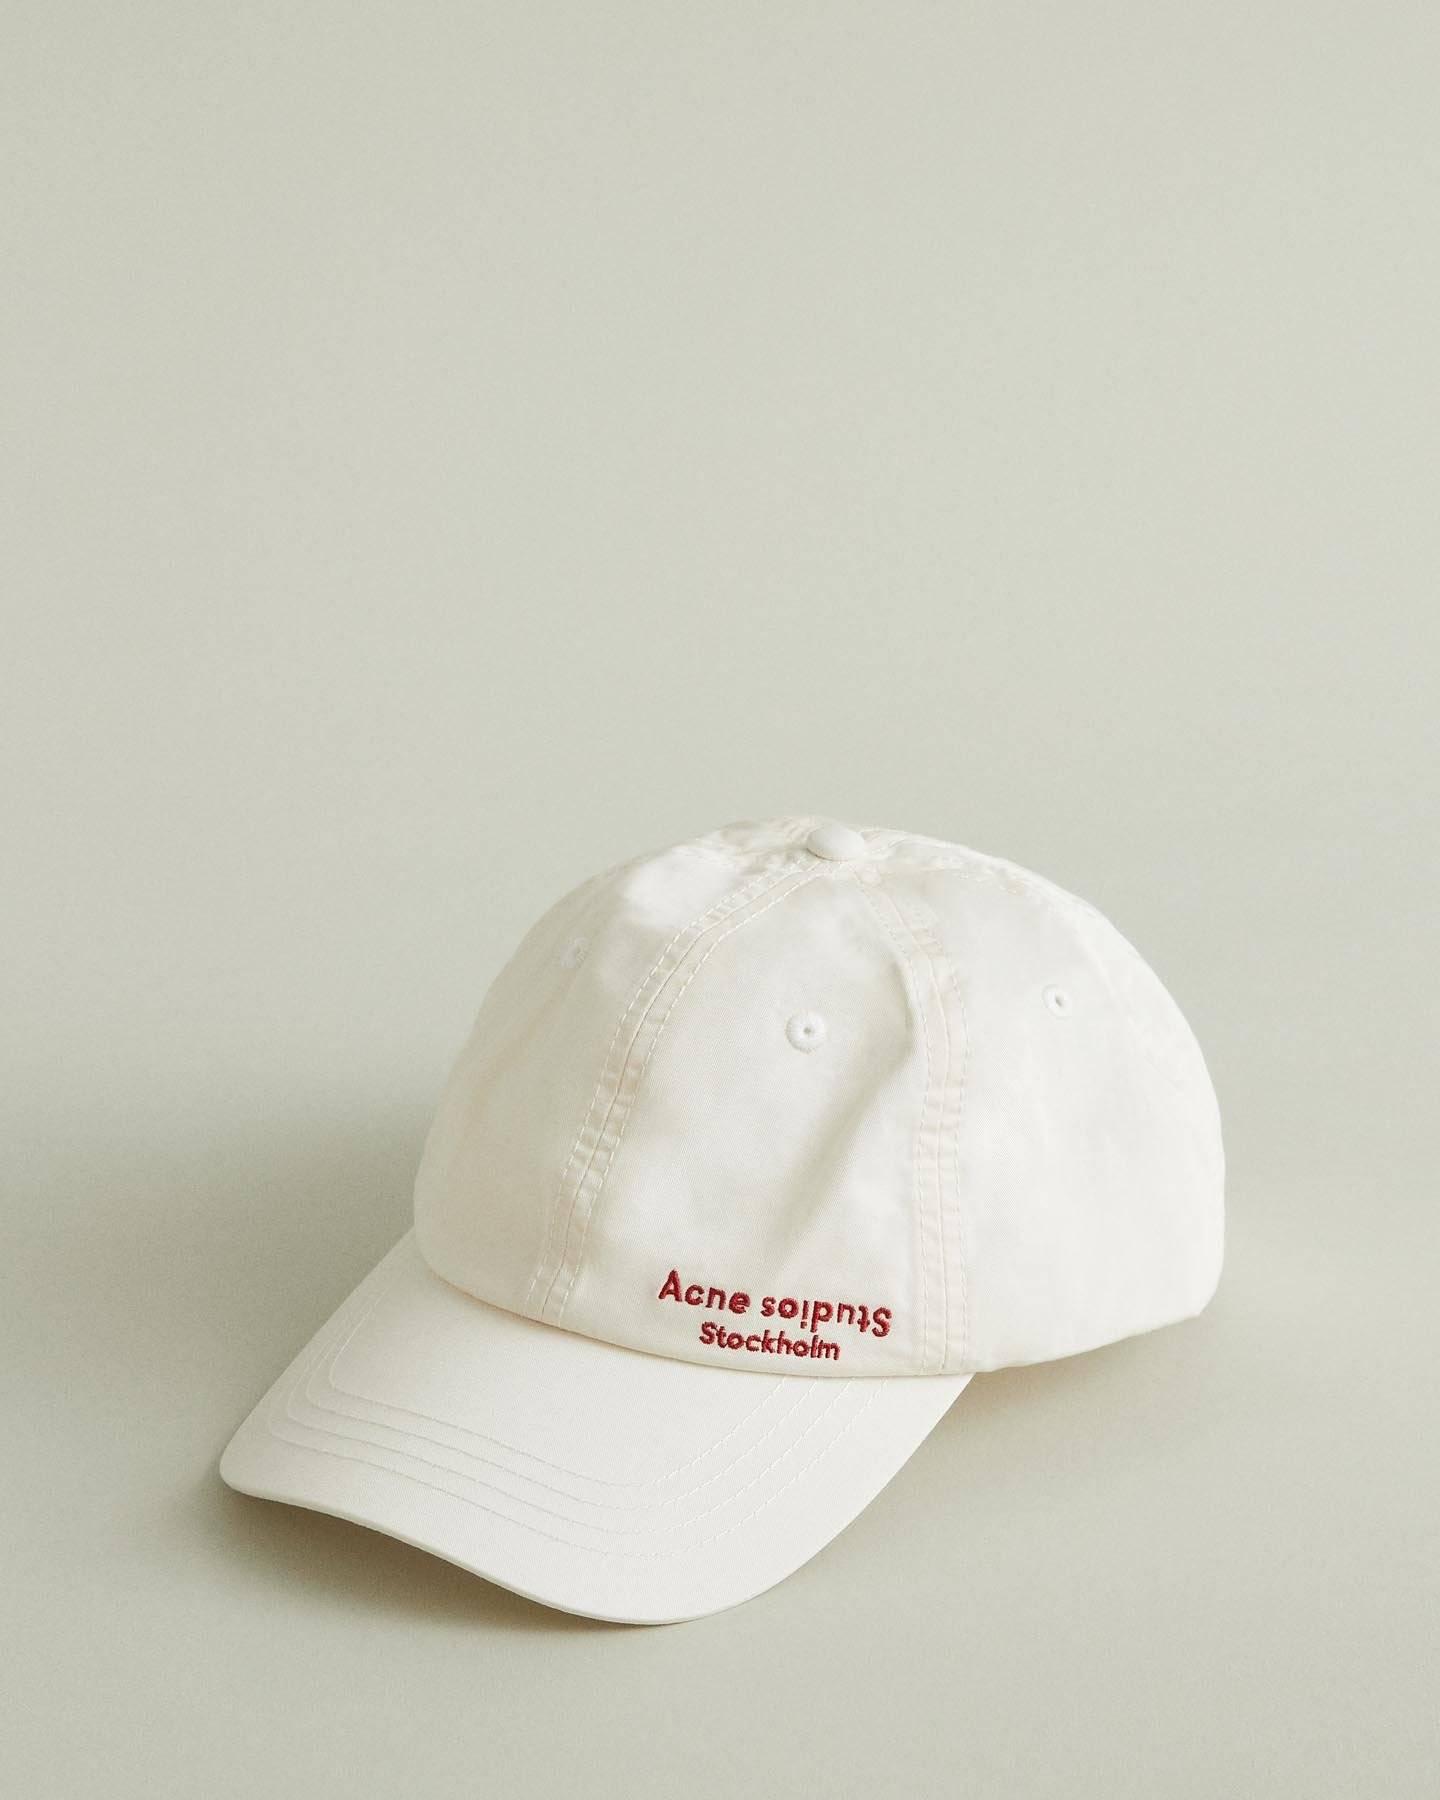 /products/carliy-dye-baseball-cap